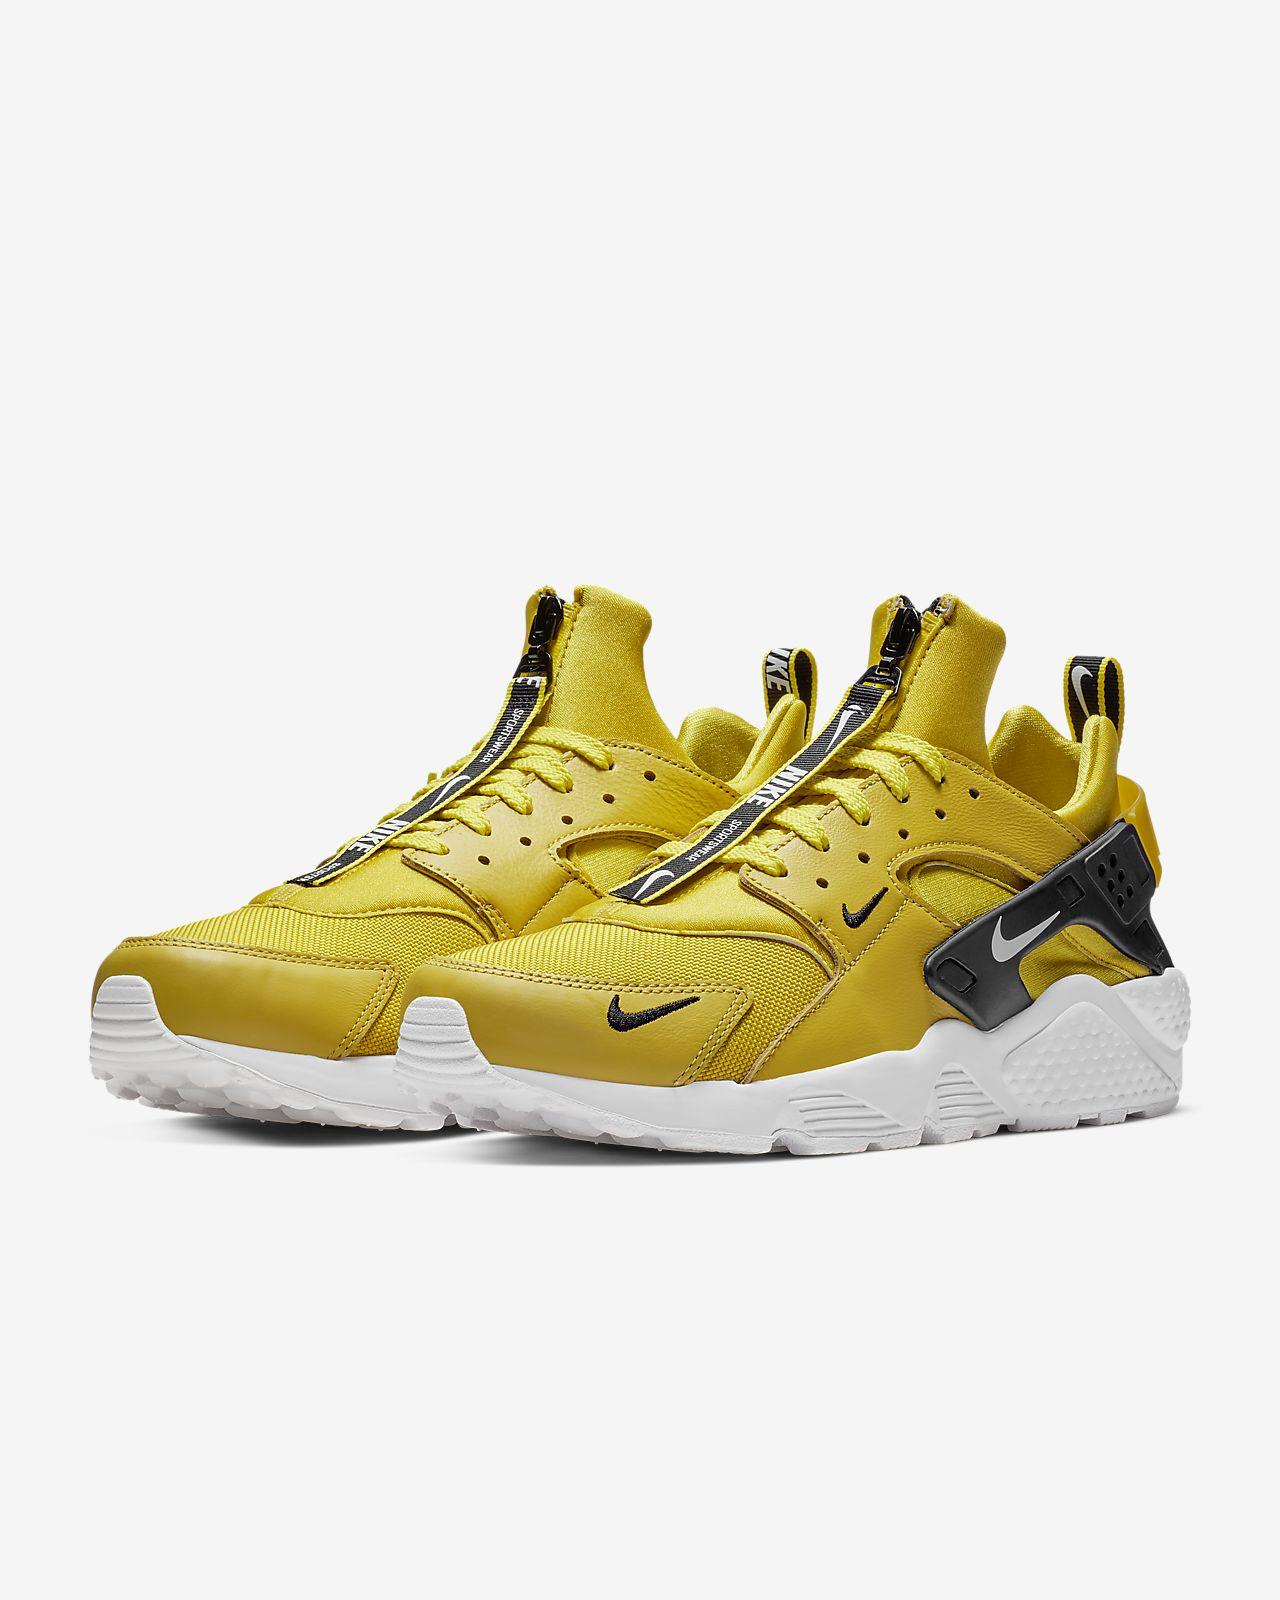 brand new 62df1 27d3c ... Nike Air Huarache Run Premium Zip Men s Shoe